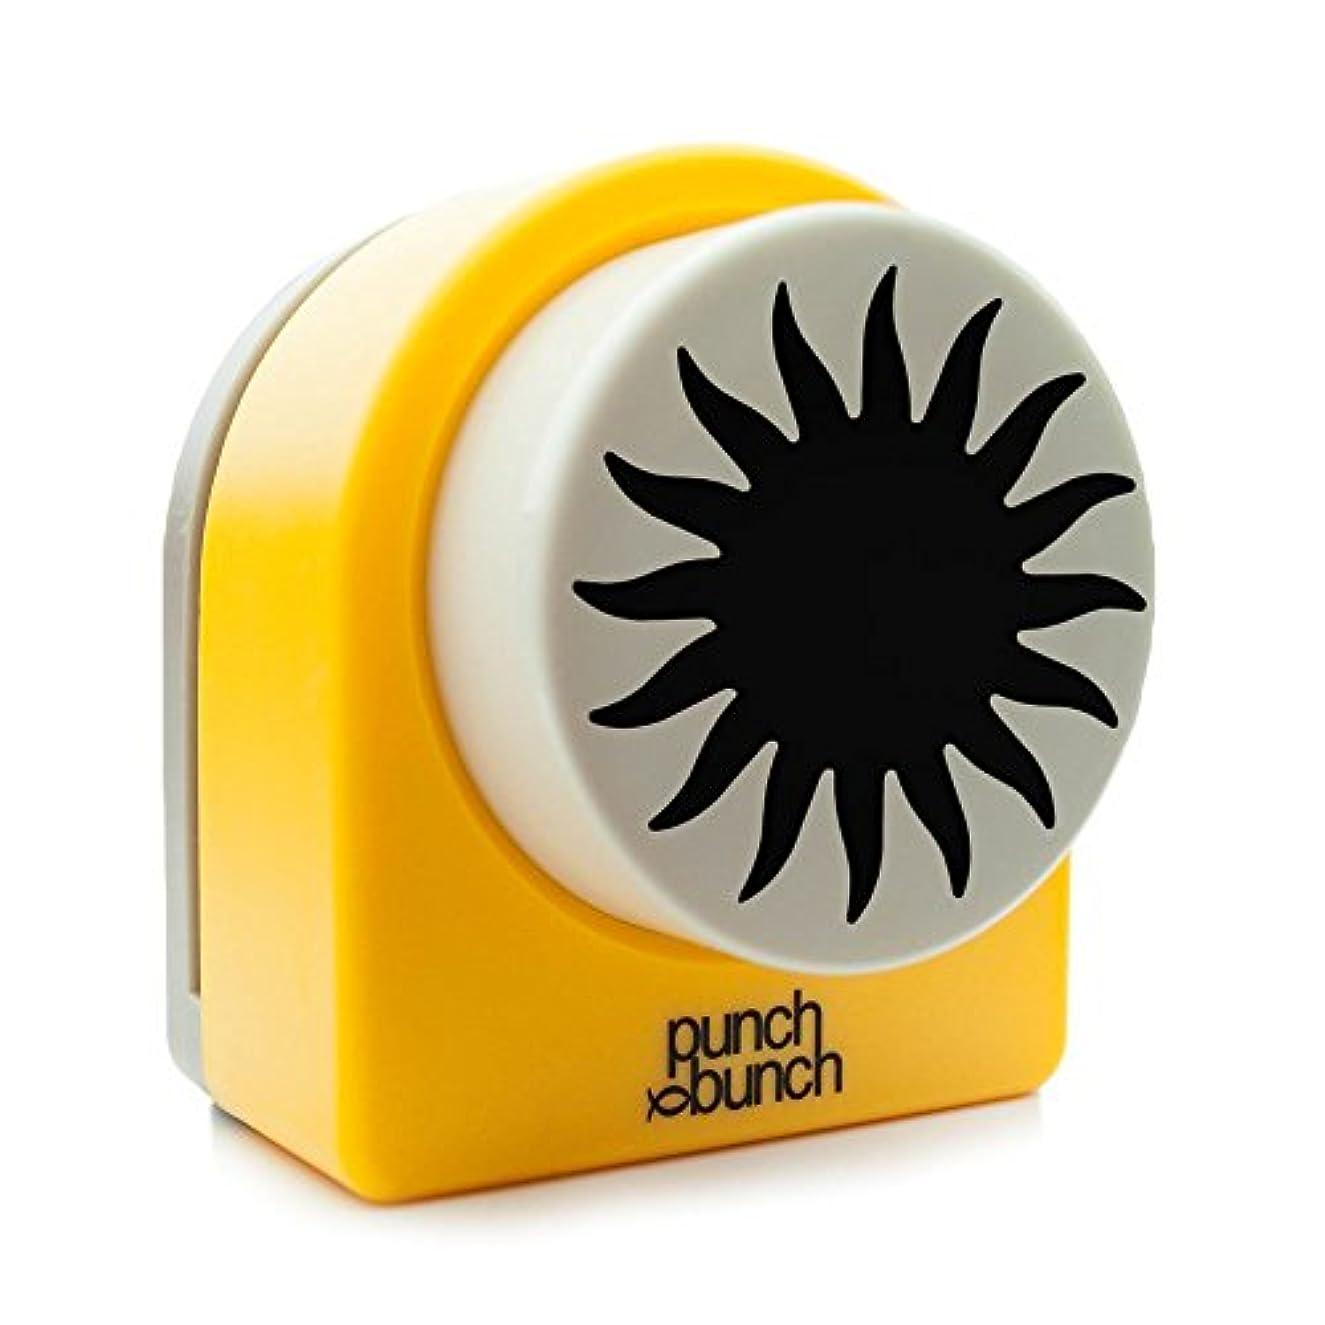 Punch Bunch Super Giant Punch, Sun